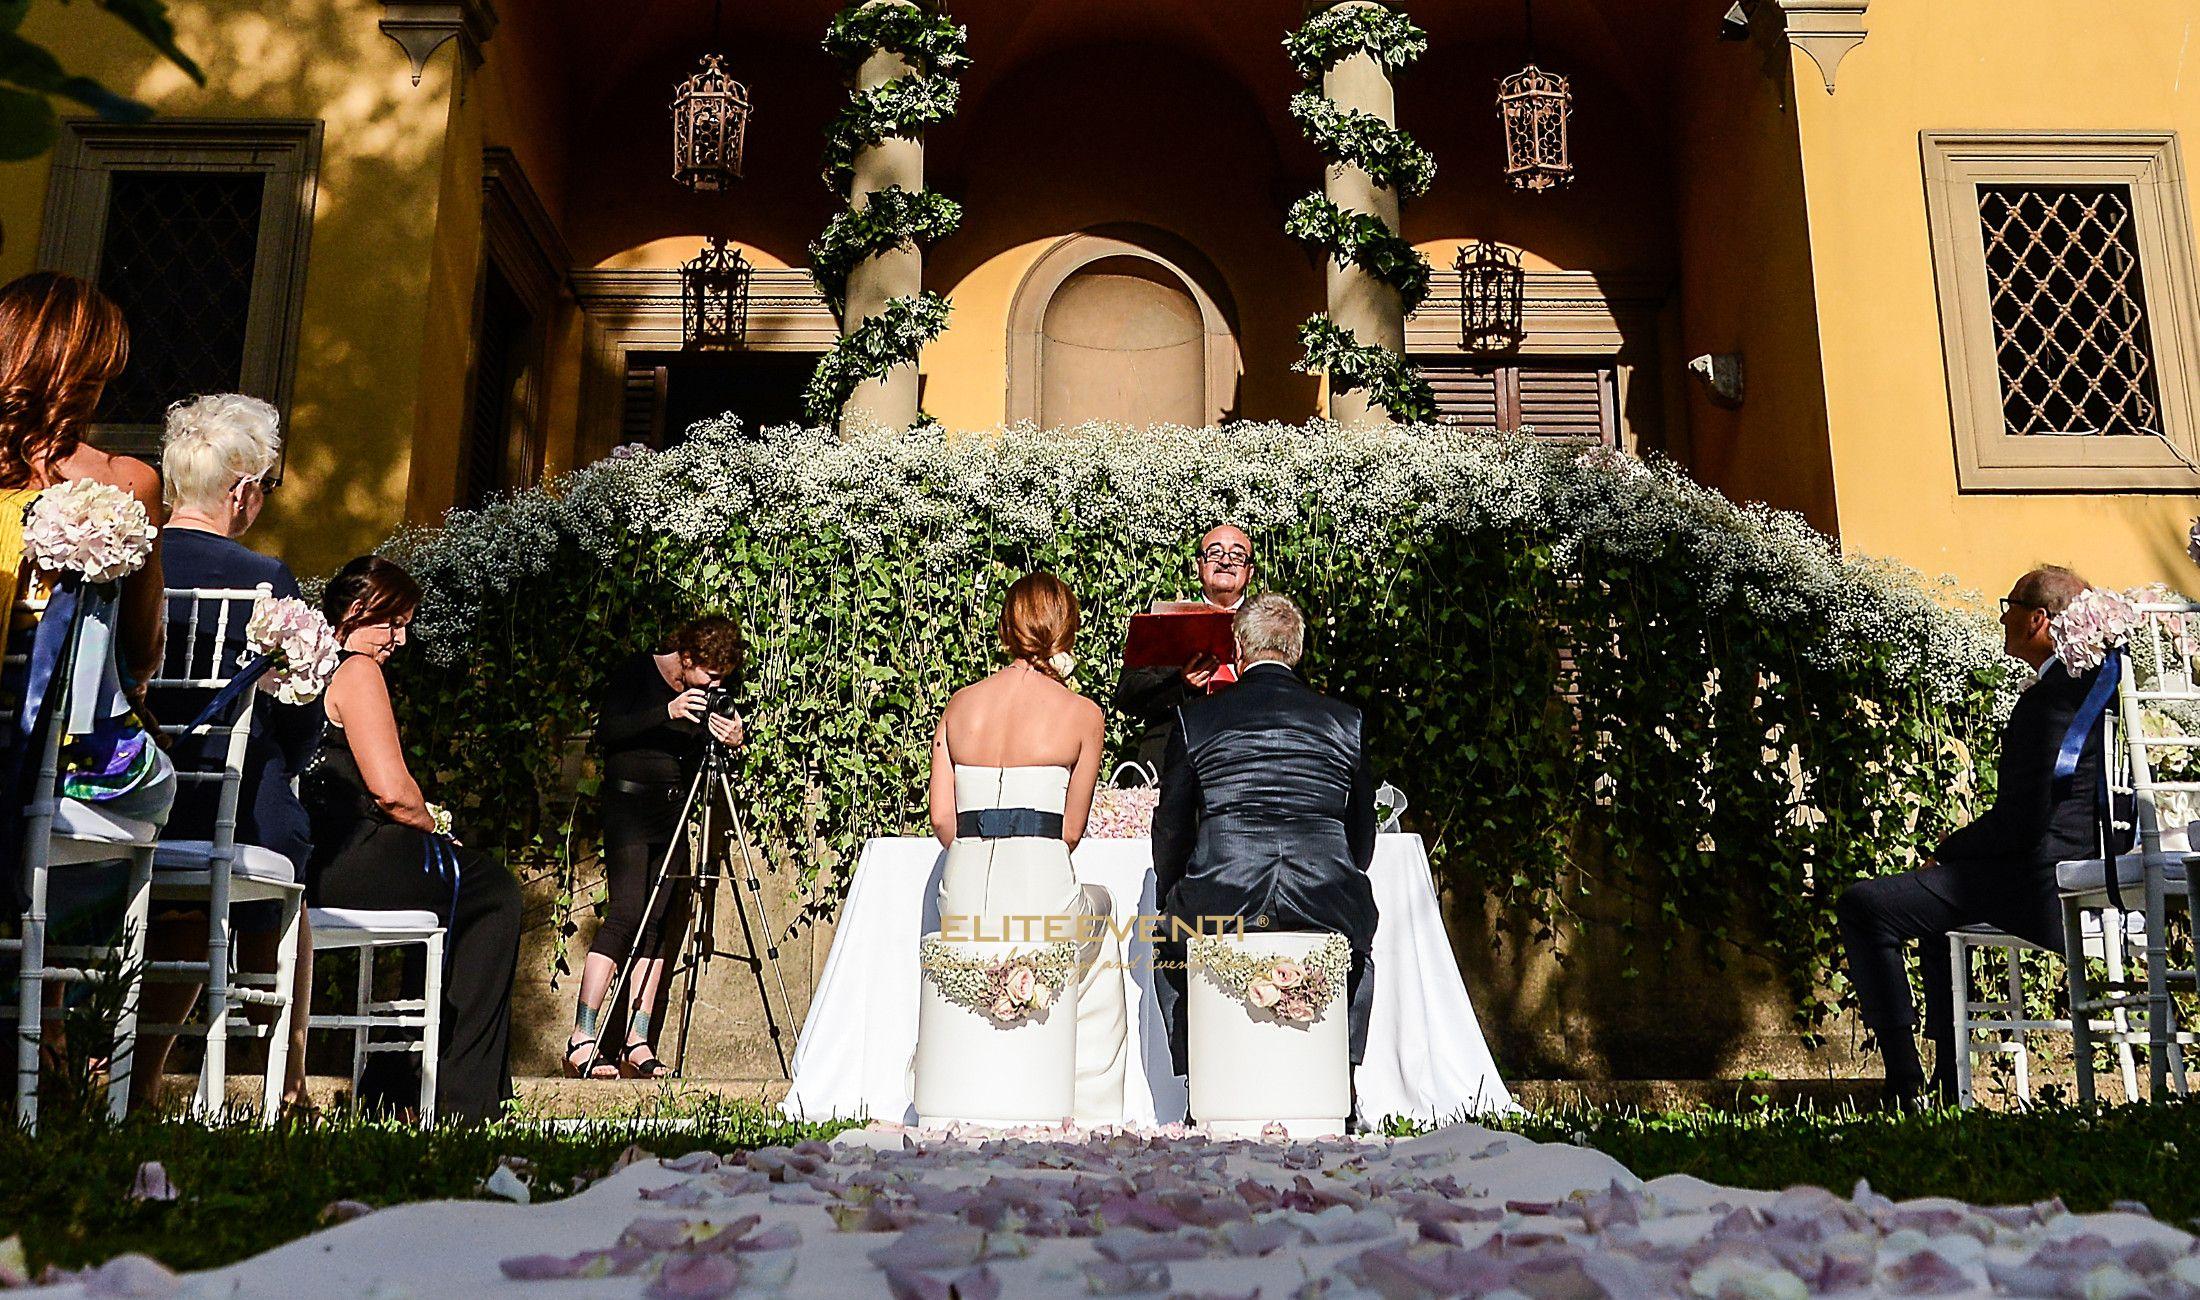 Matrimonio_in_Toscana_by_eliteeventi